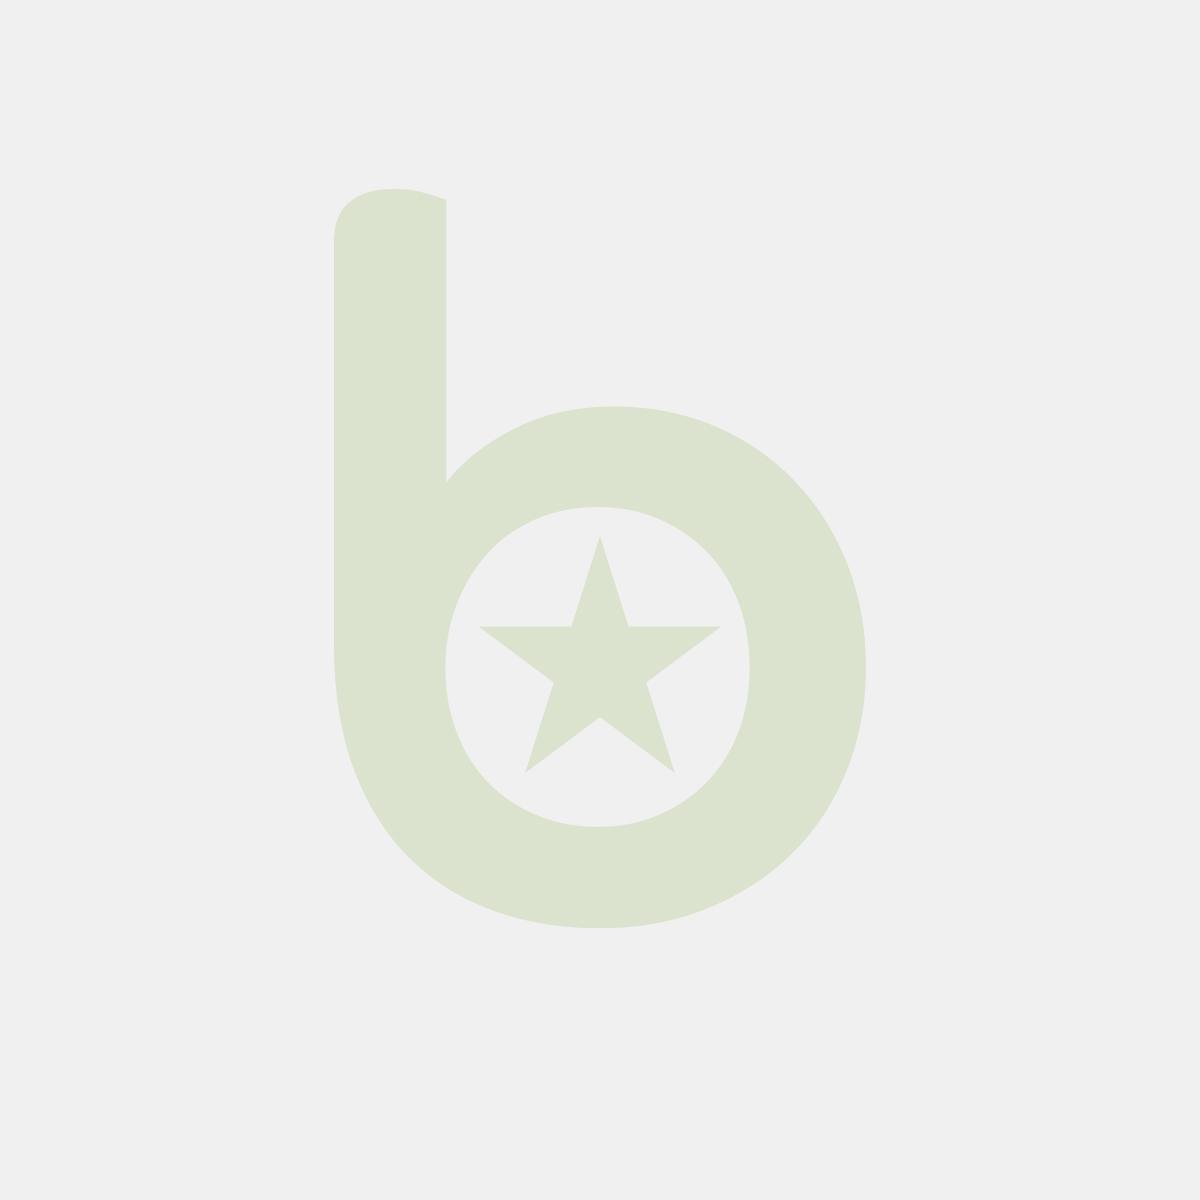 Antyrama DONAU, pleksi, 100x150mm